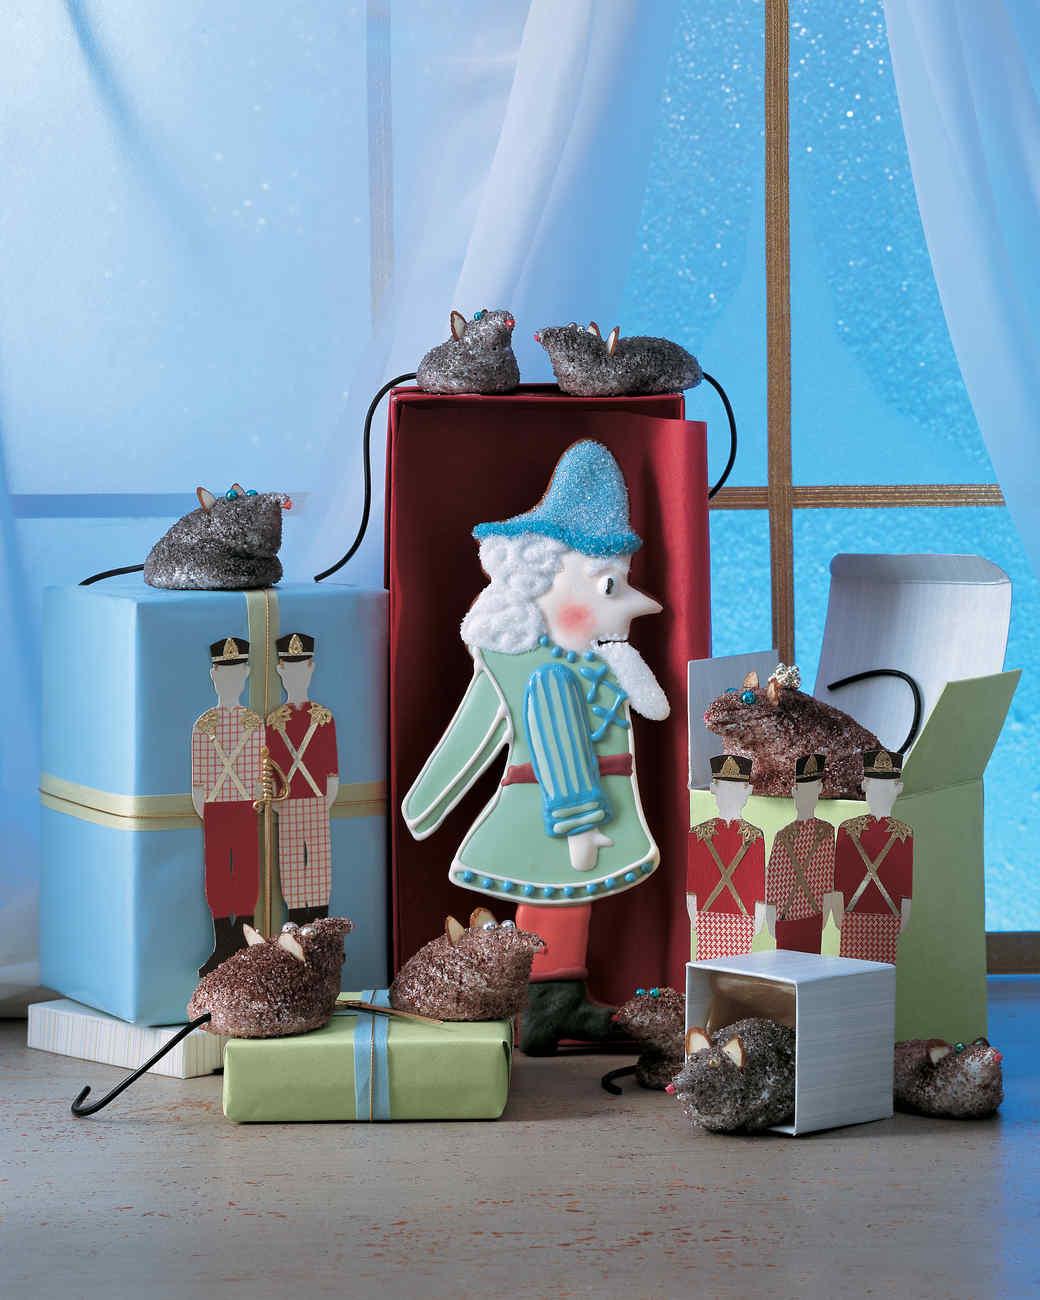 mice-battle-dessert-1201-mla99019.jpg